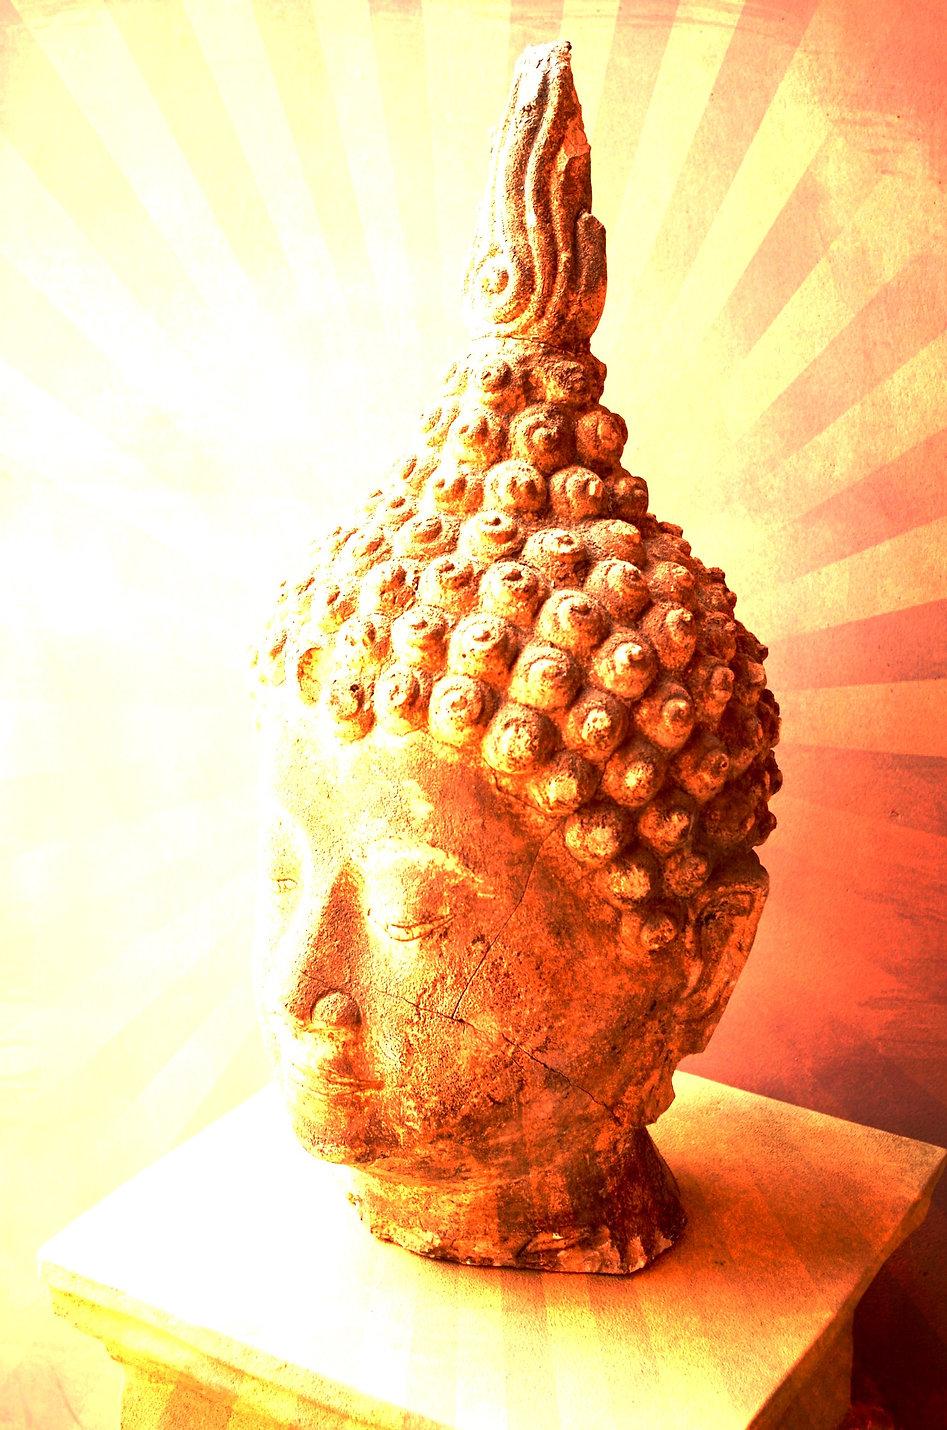 Buddah Head Statue